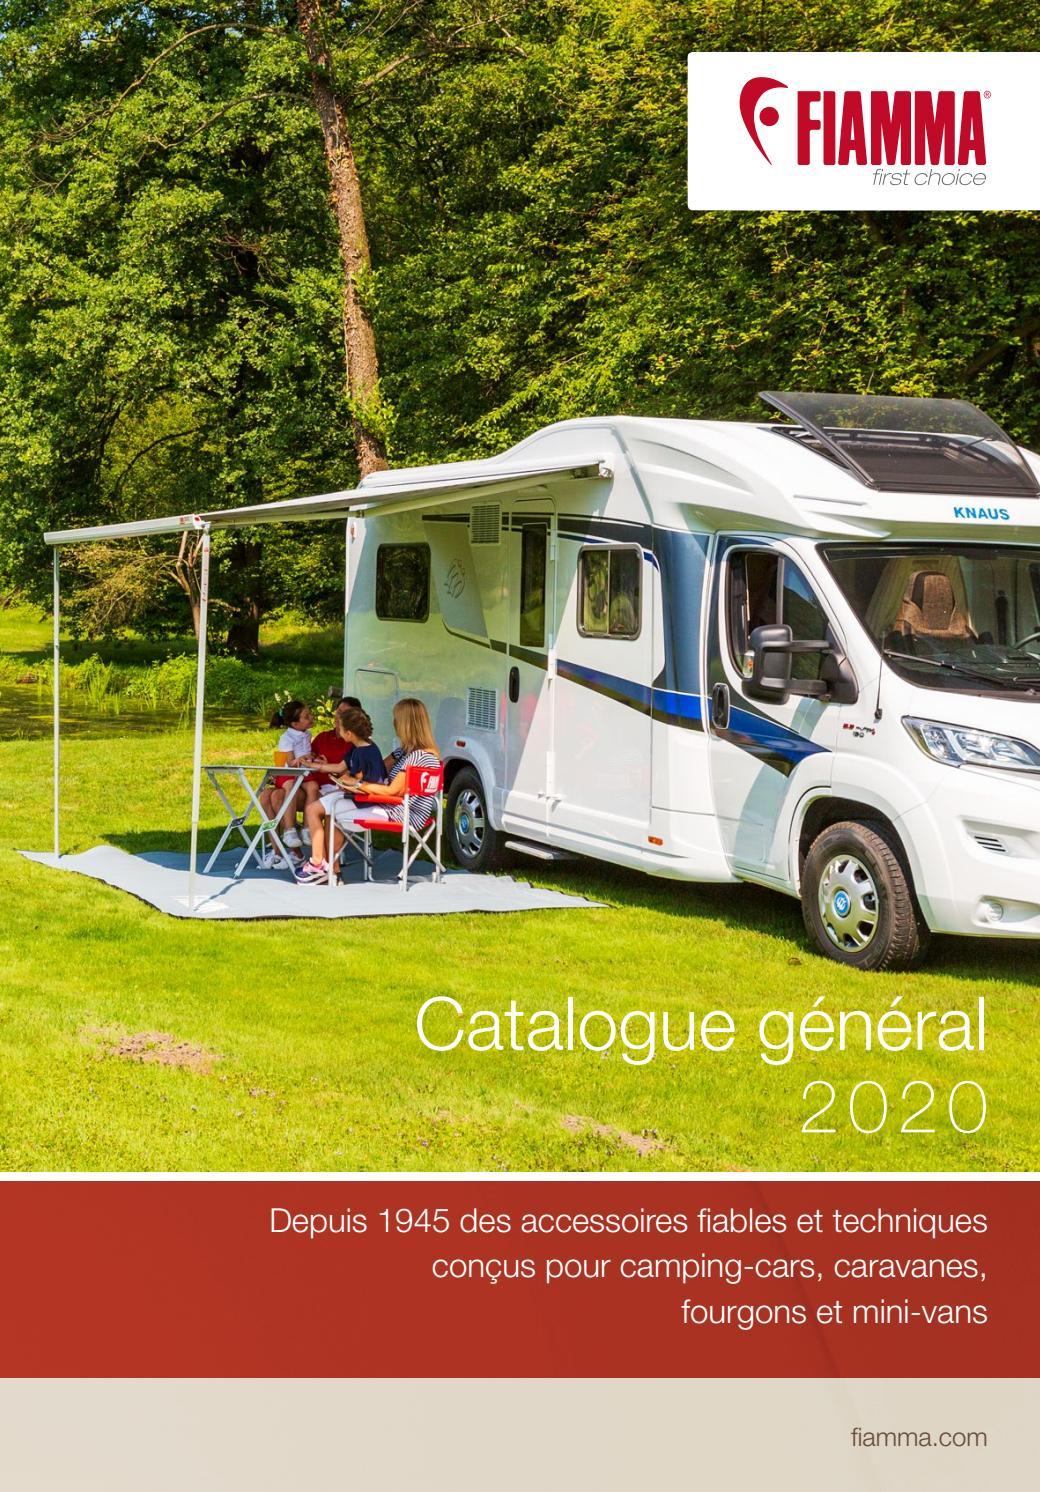 Auvent Tente vis en Peg Perceuse Adaptateur prise 13 mm Caravane Camping-car camping